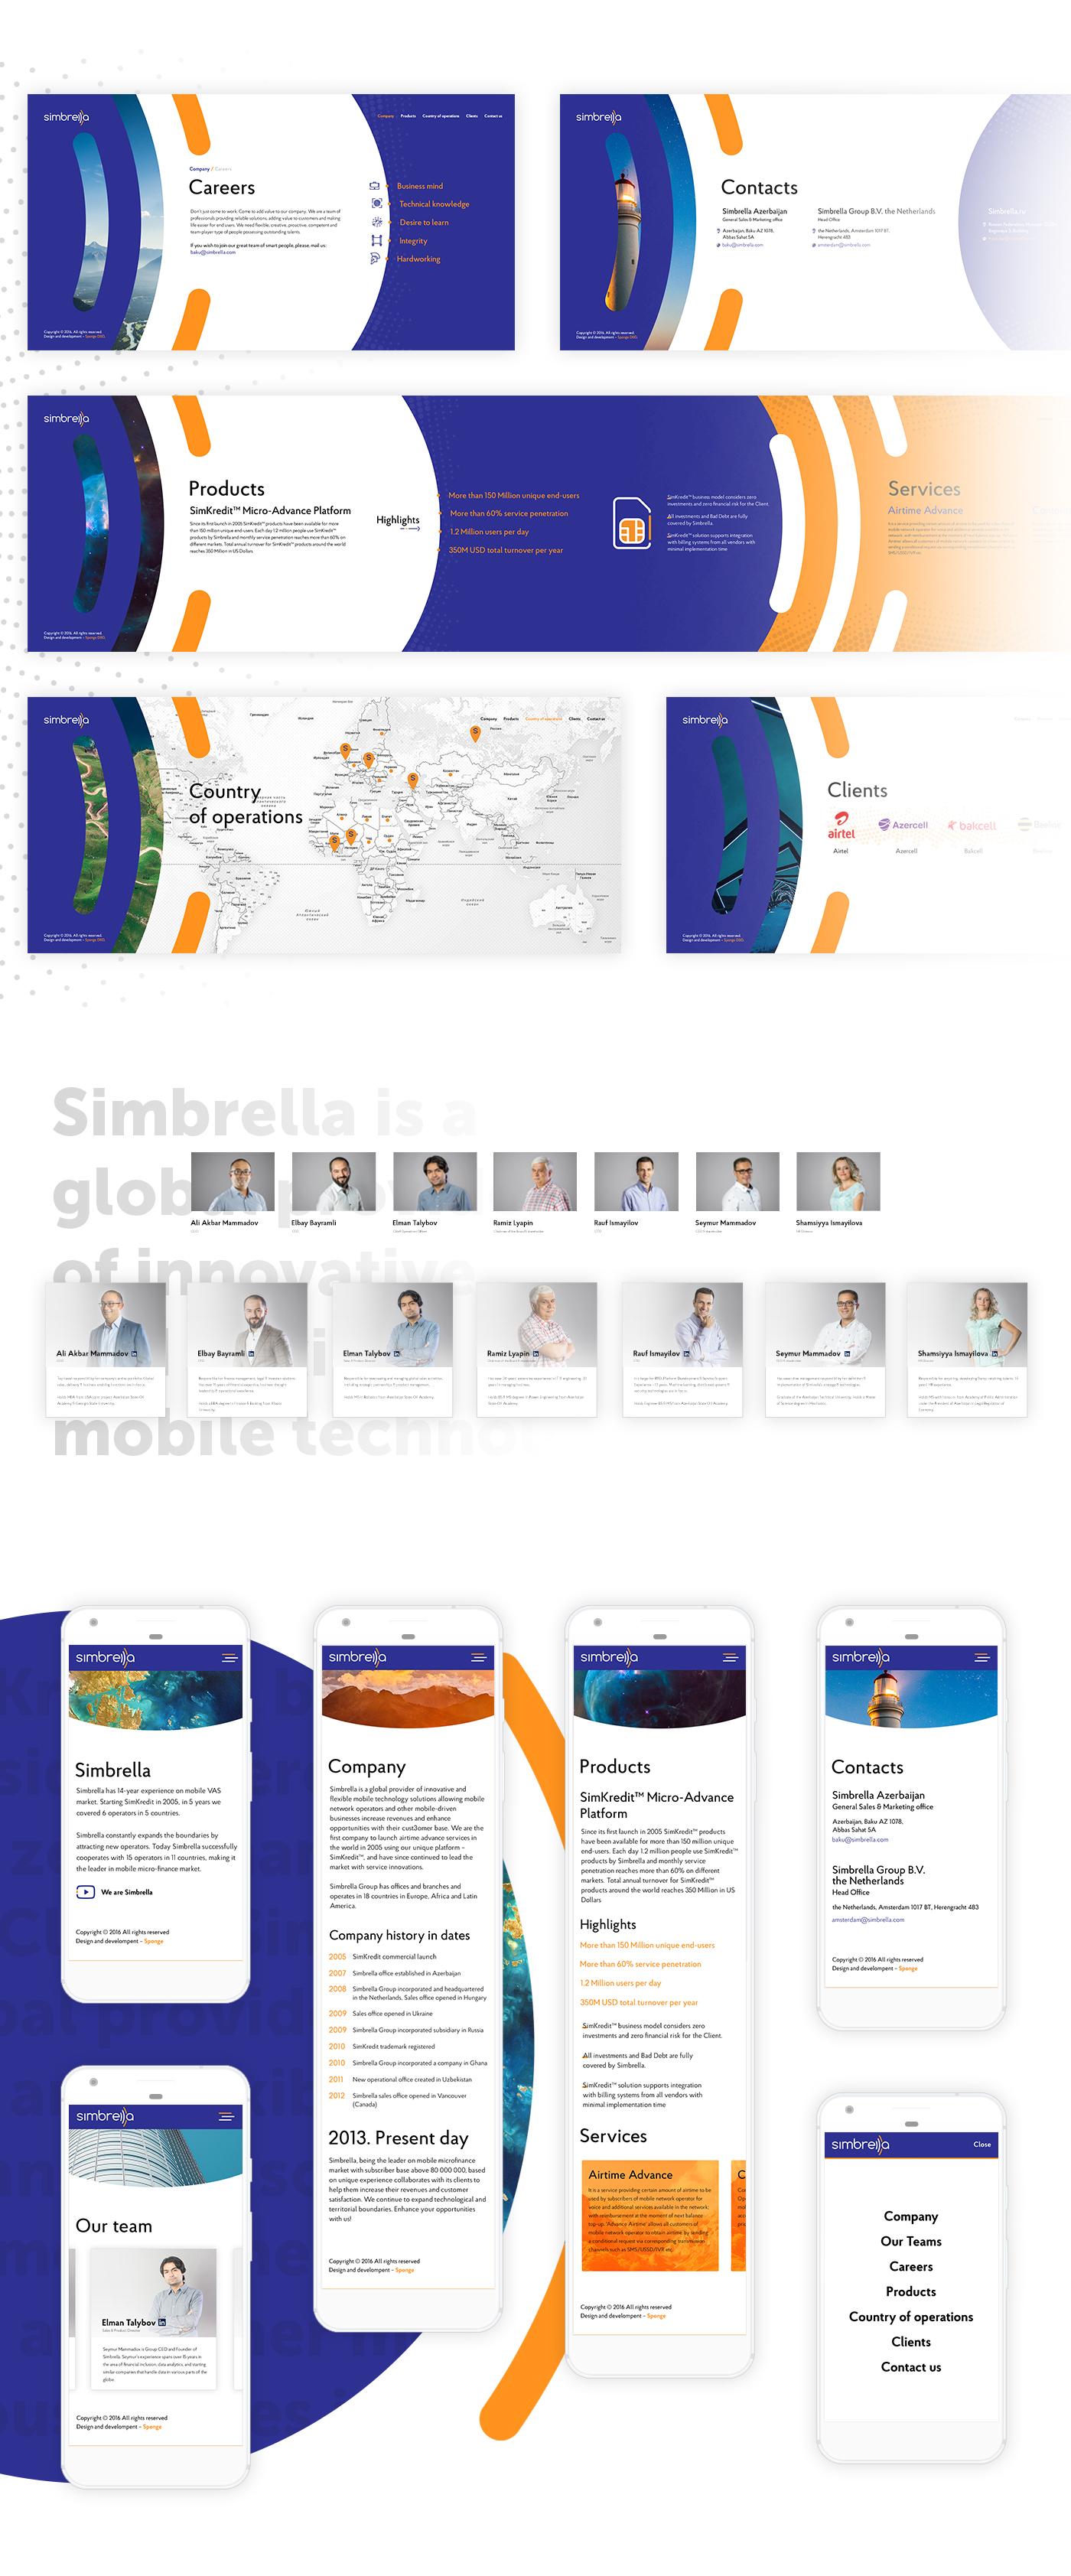 Corporate Promotional Website For Simbrella Simbrella Creates Products For Mobile Operators All Over The World The Comp Mobile Operator Site Design Web Design